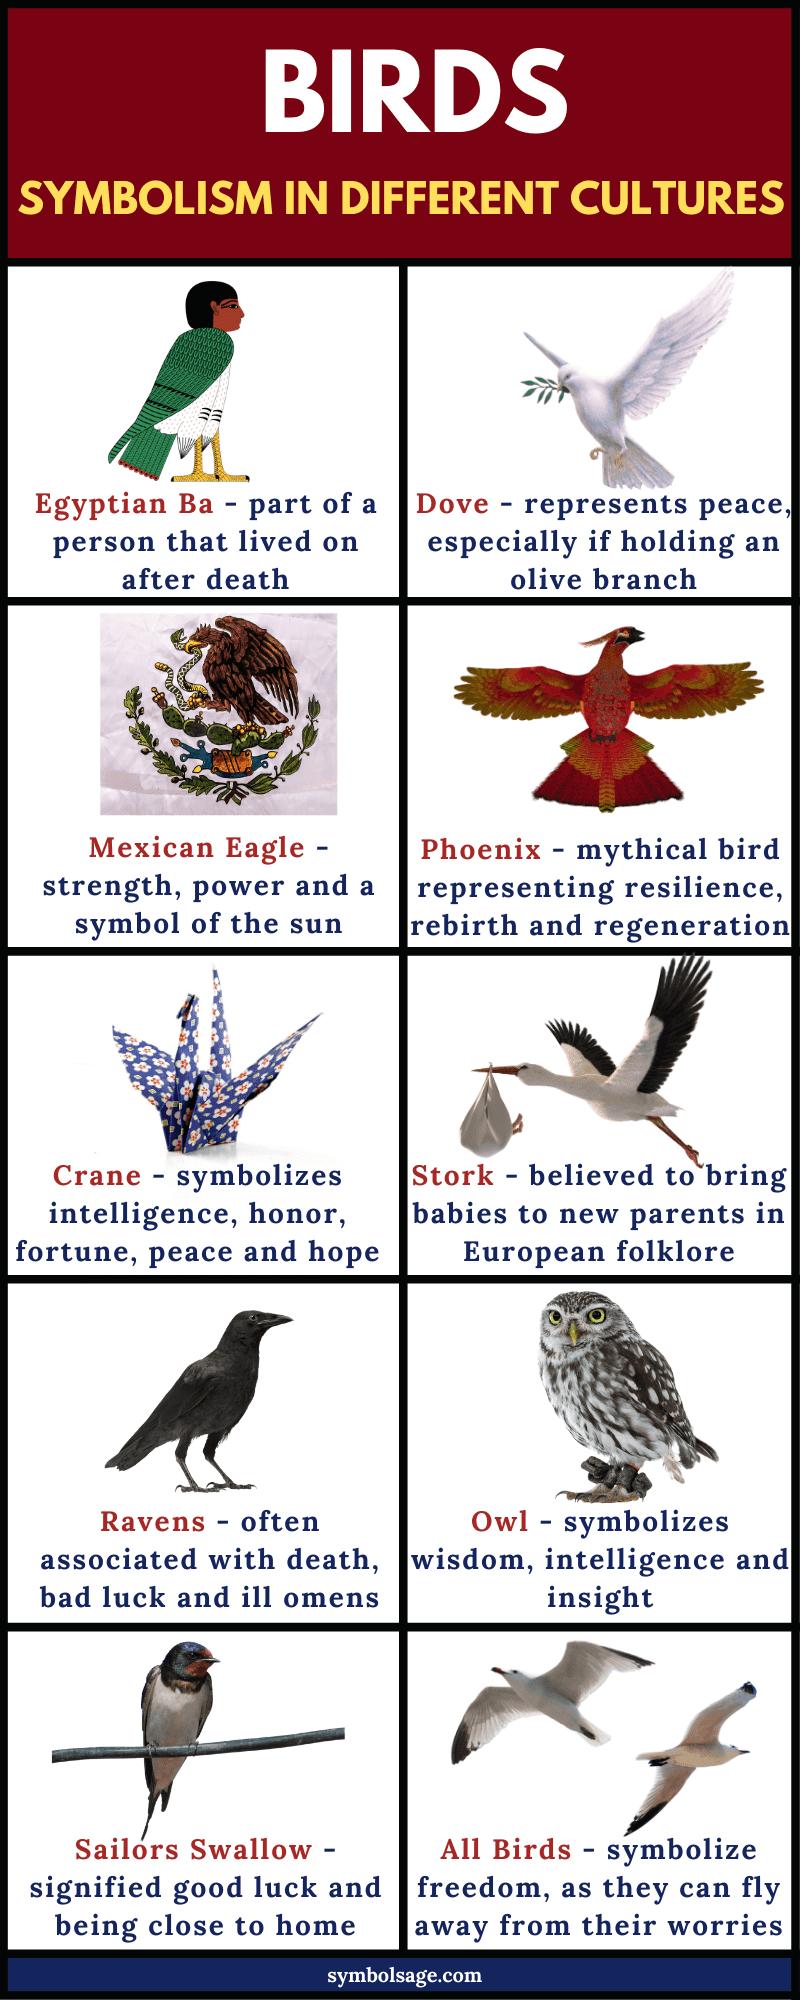 Symbolism of birds in different cultures